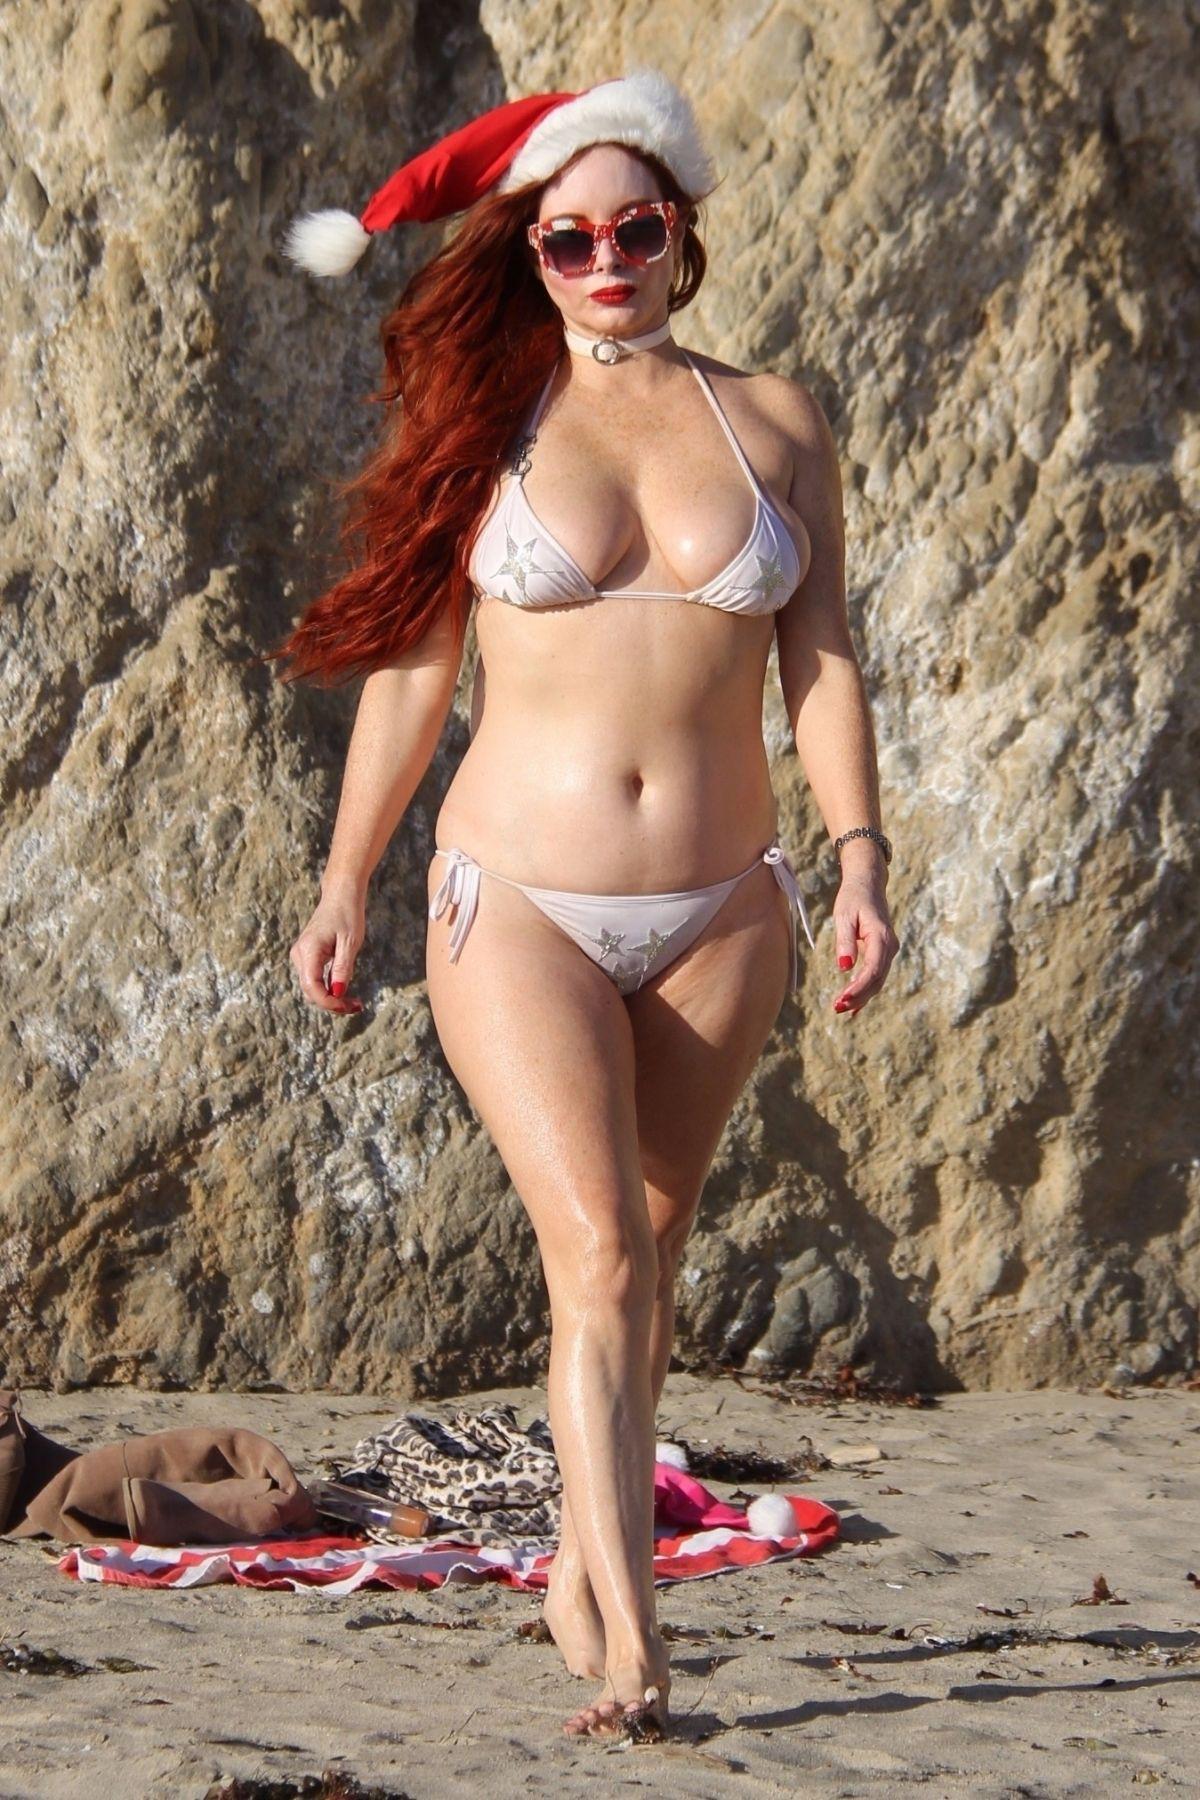 Bikini Phoebe Price nudes (21 foto and video), Topless, Paparazzi, Boobs, swimsuit 2018